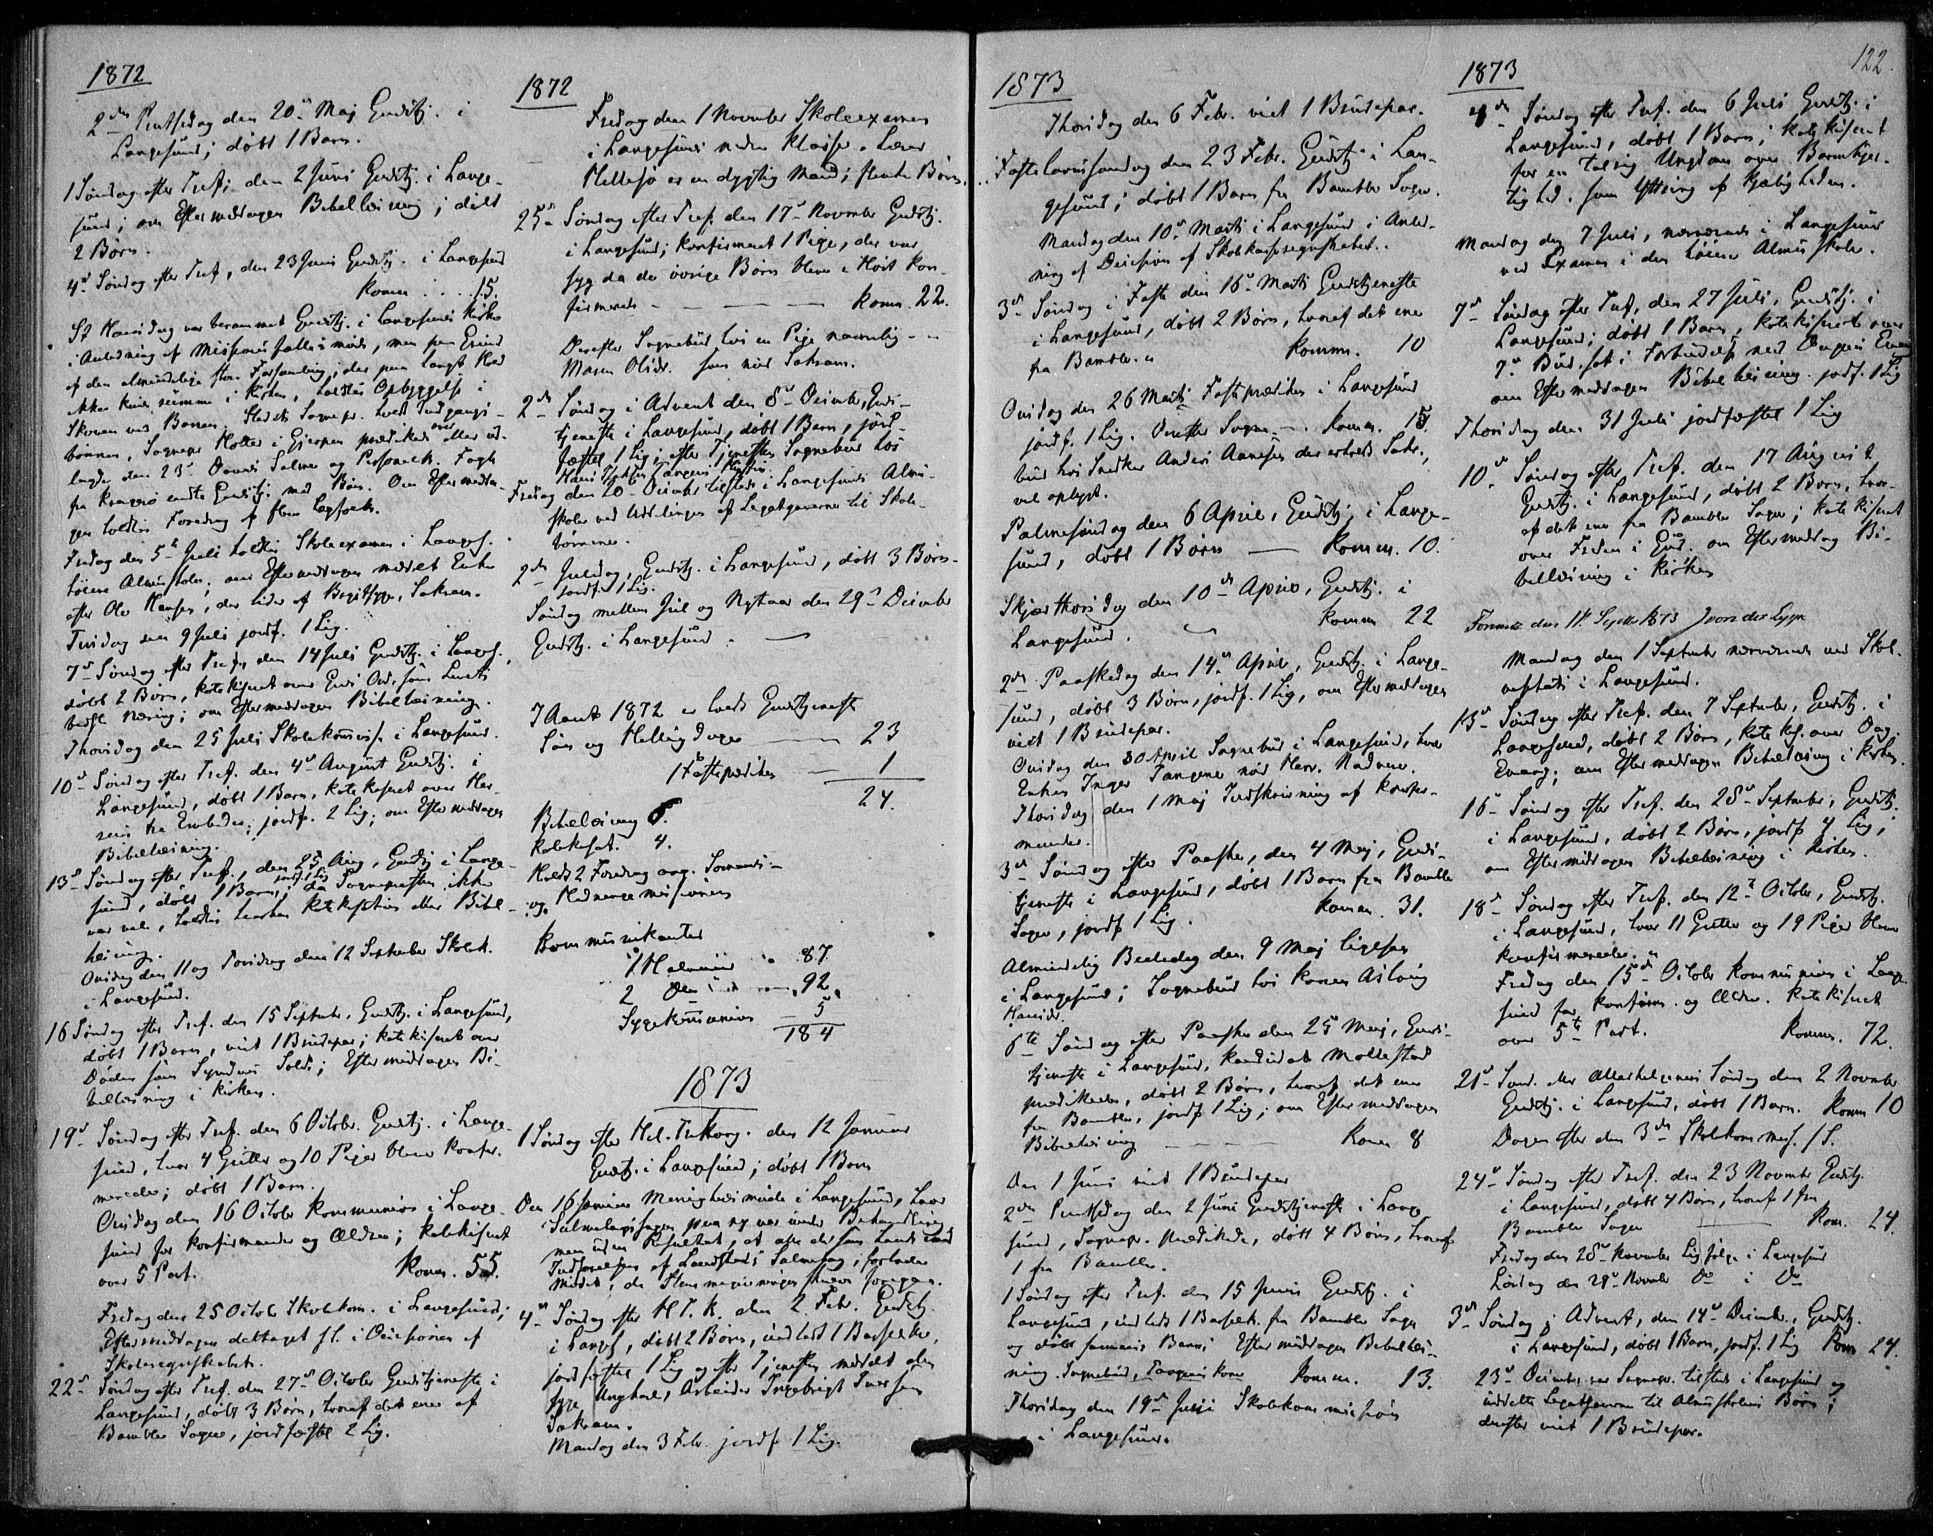 SAKO, Langesund kirkebøker, F/Fa/L0001: Ministerialbok nr. 1, 1870-1877, s. 122